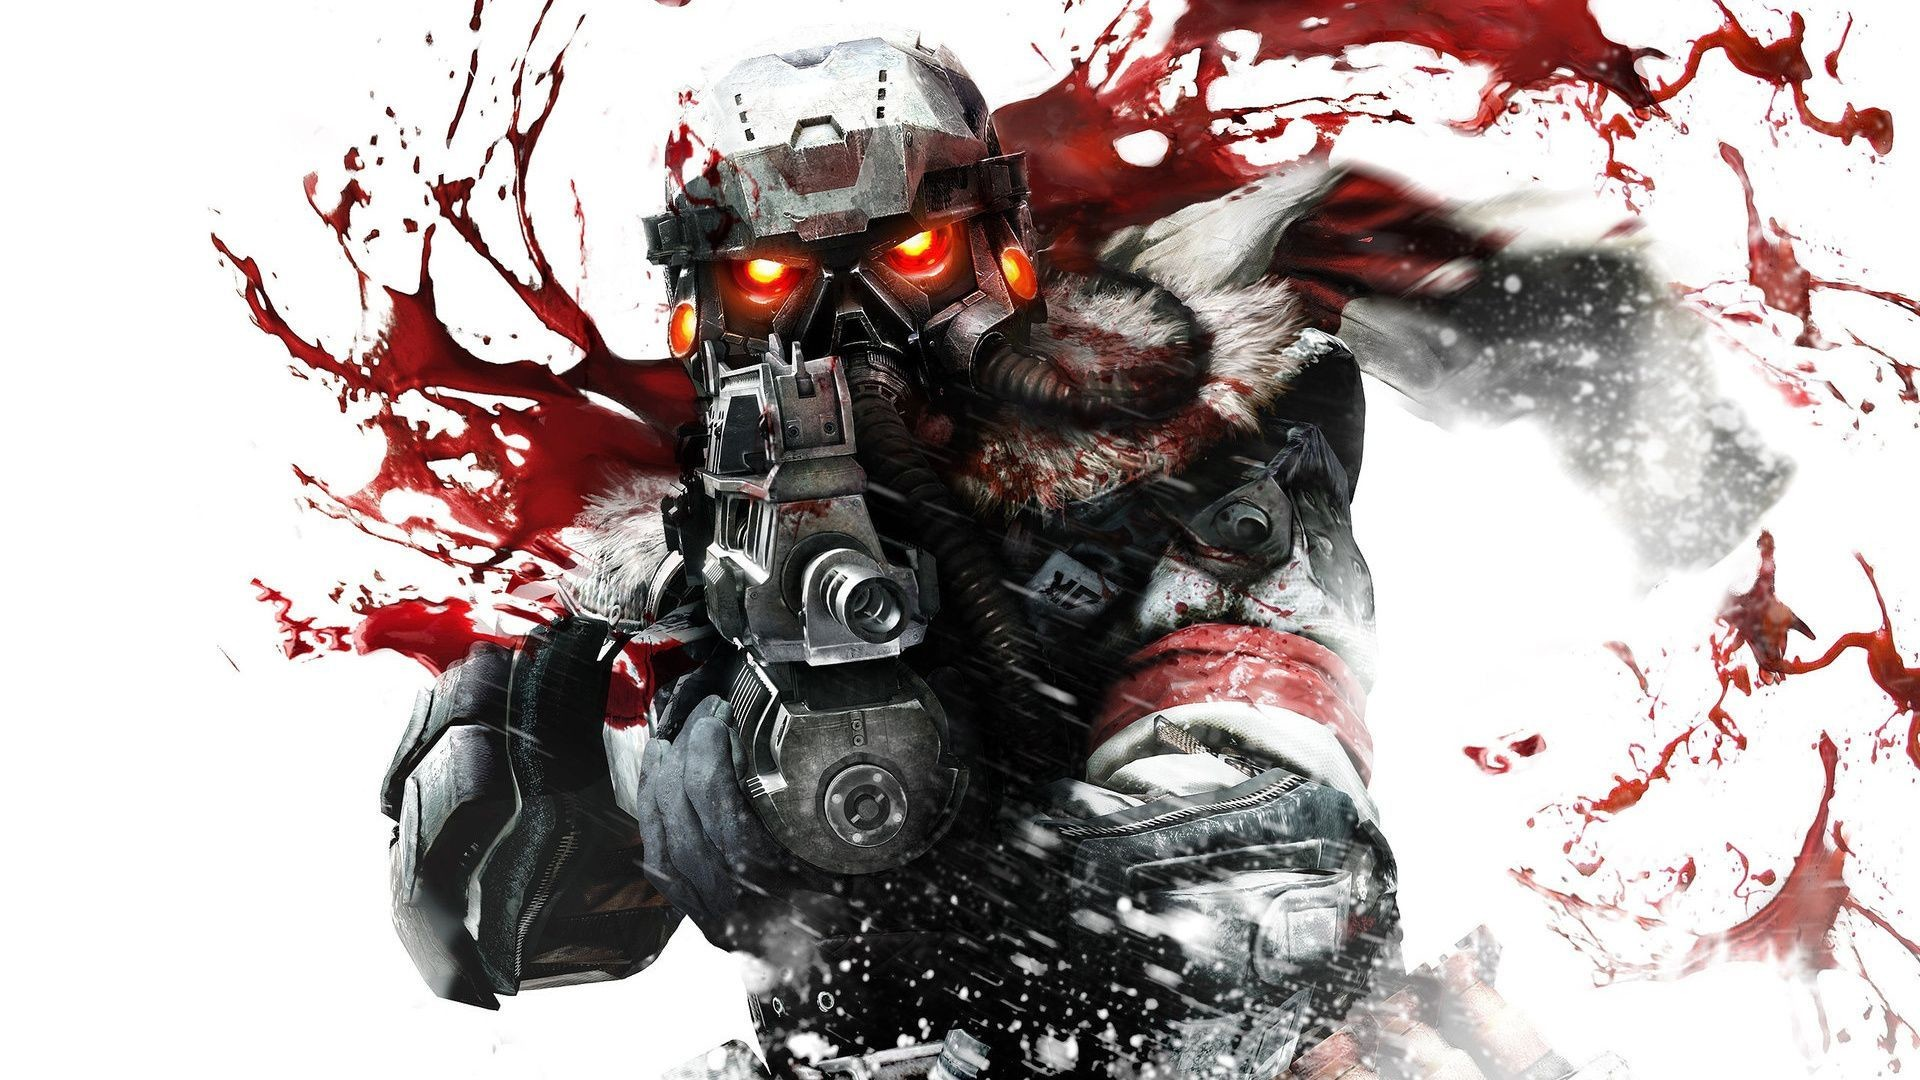 Kill Zone 3 Pc Game 1080p Hd Desktop Wallpaper